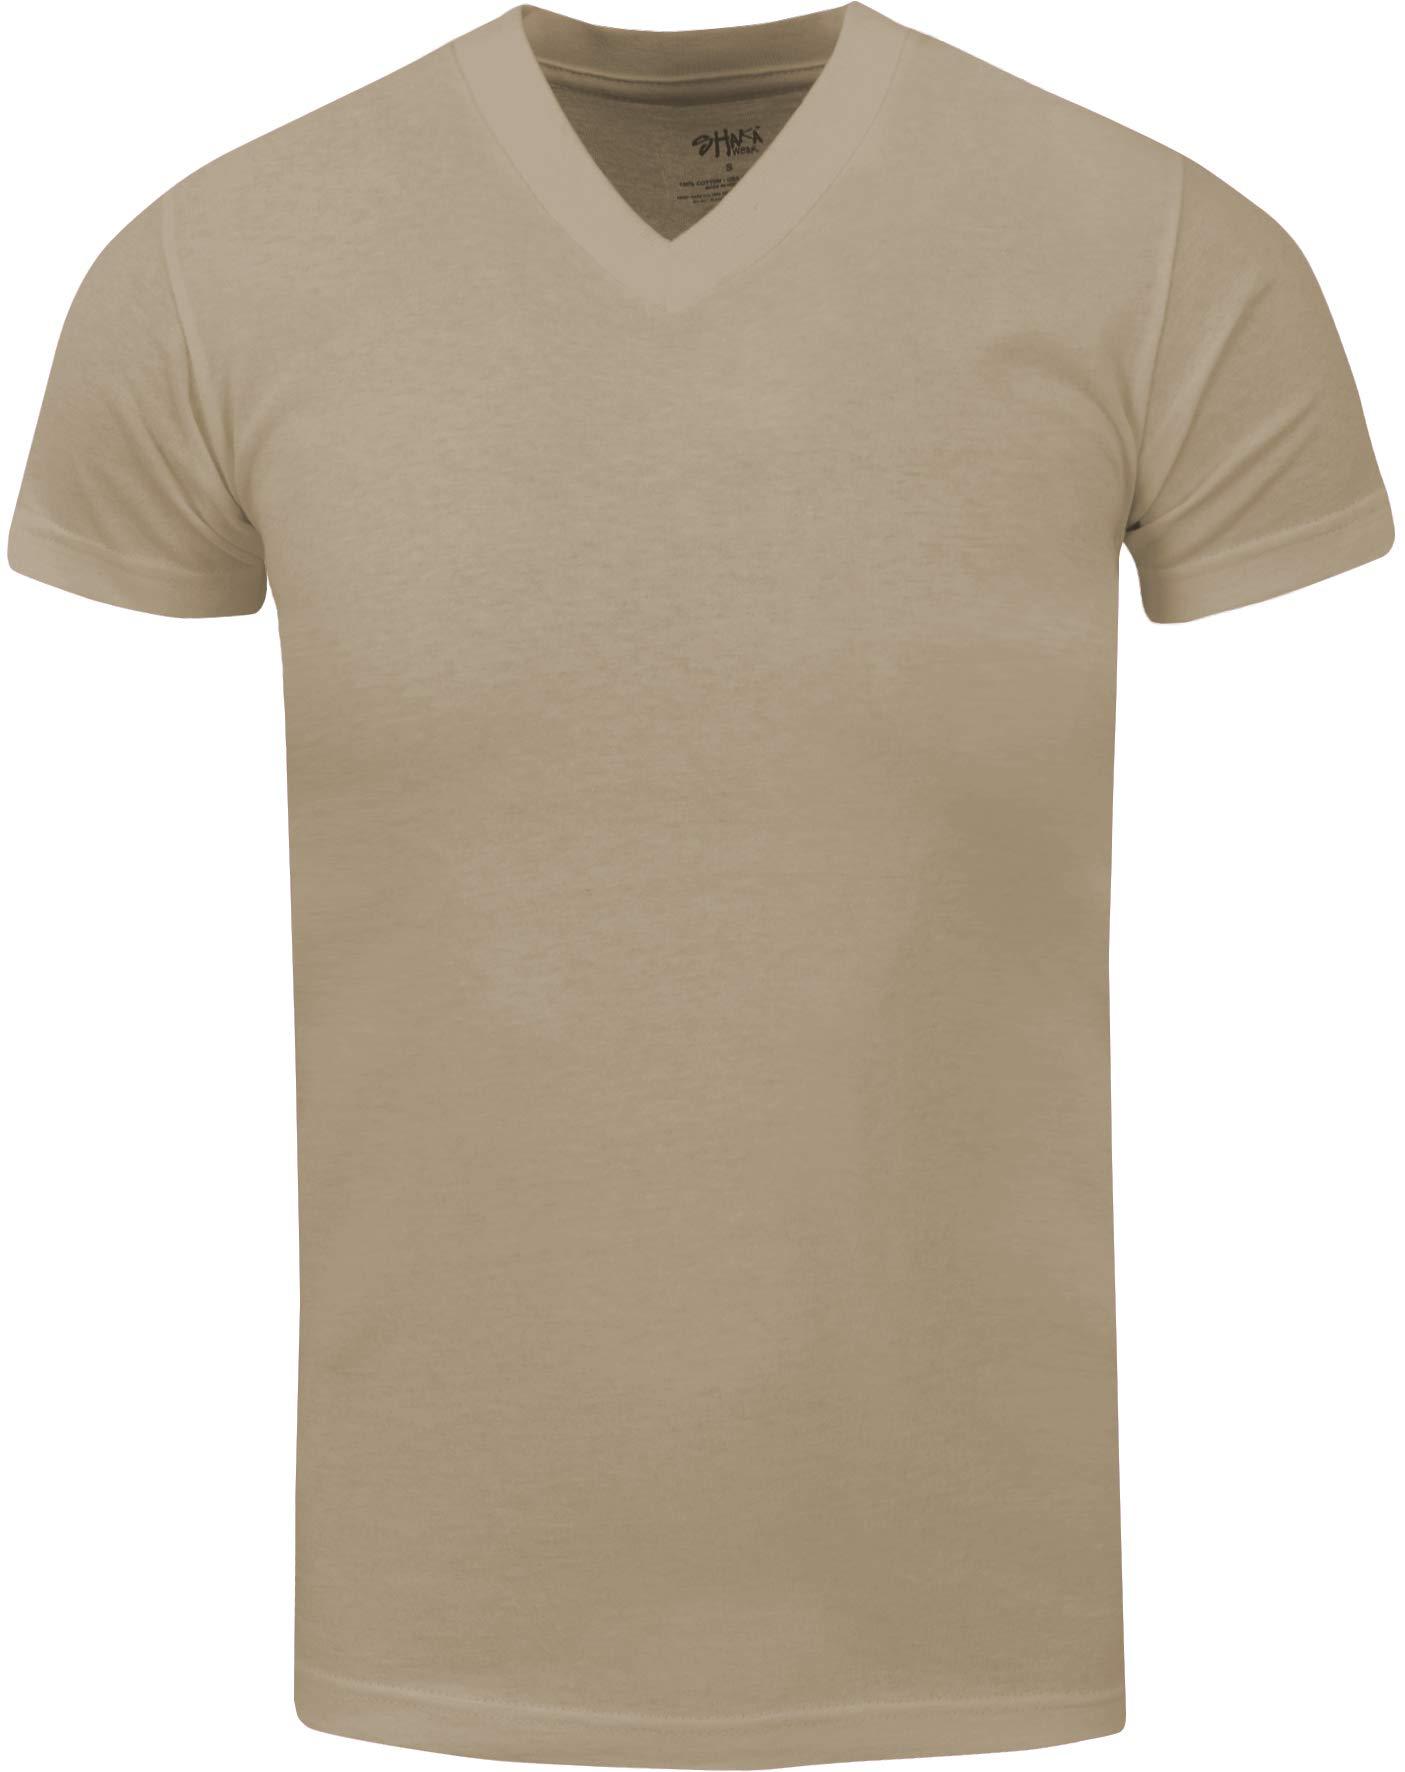 VNS20_ Active Mens Premium Cotton Heavy Weight V Neck Basic T Shirt Khaki by Shaka Wear (Image #1)